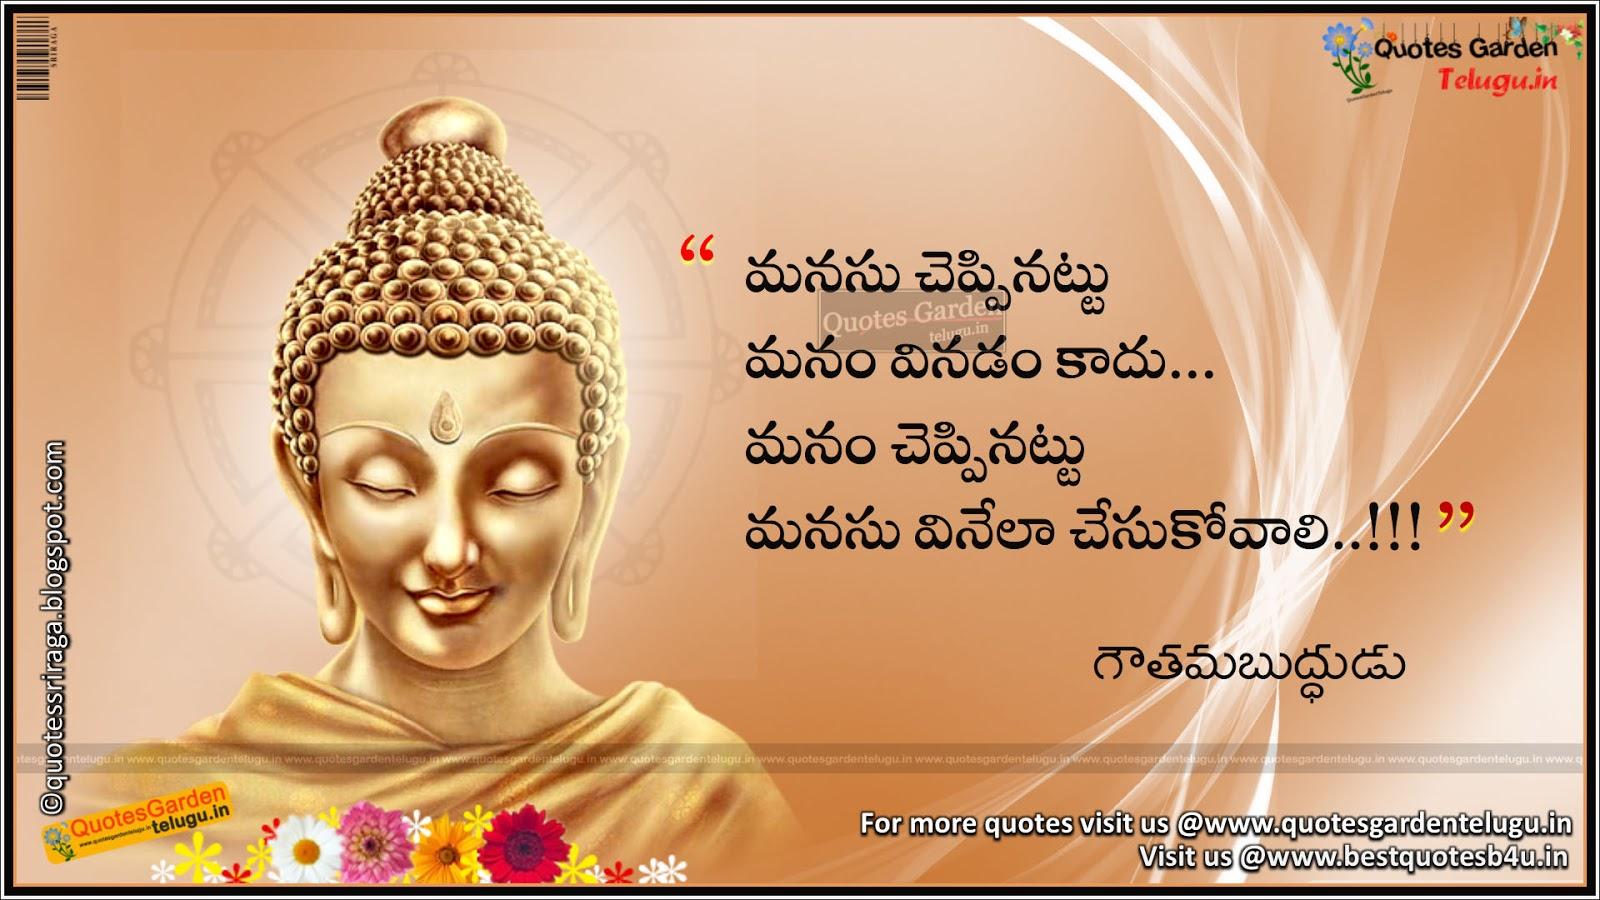 Best Telugu Gautama Buddha Quotations Quotes Garden Telugu